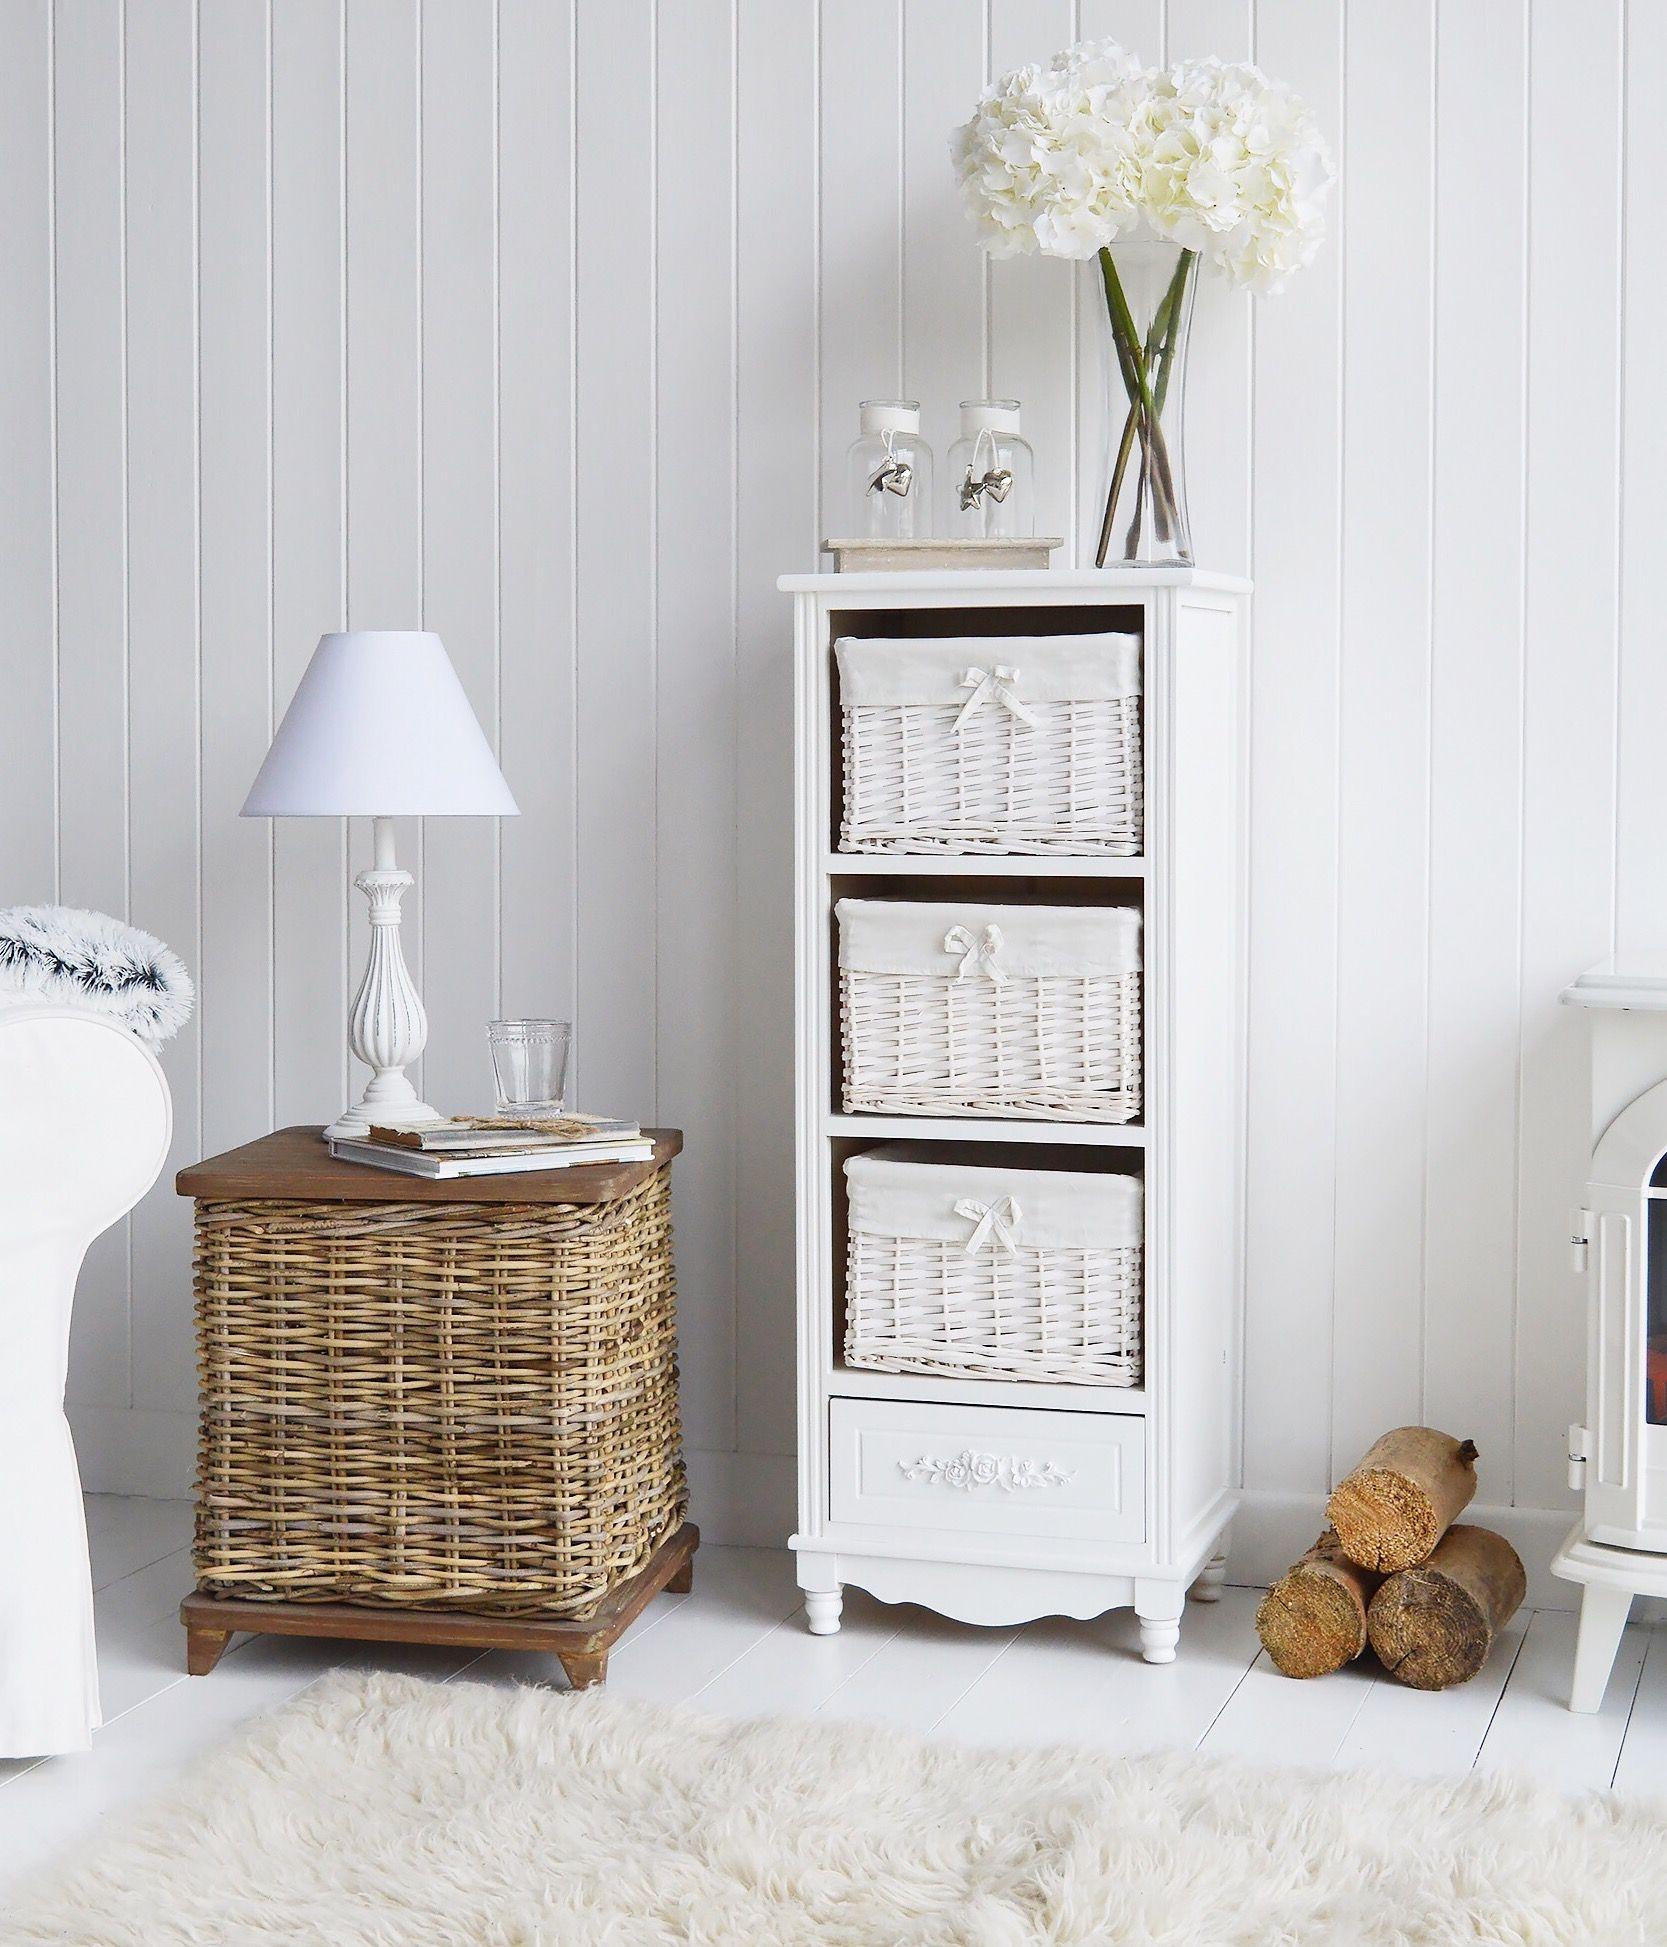 Home Decorating Ideas & Interior